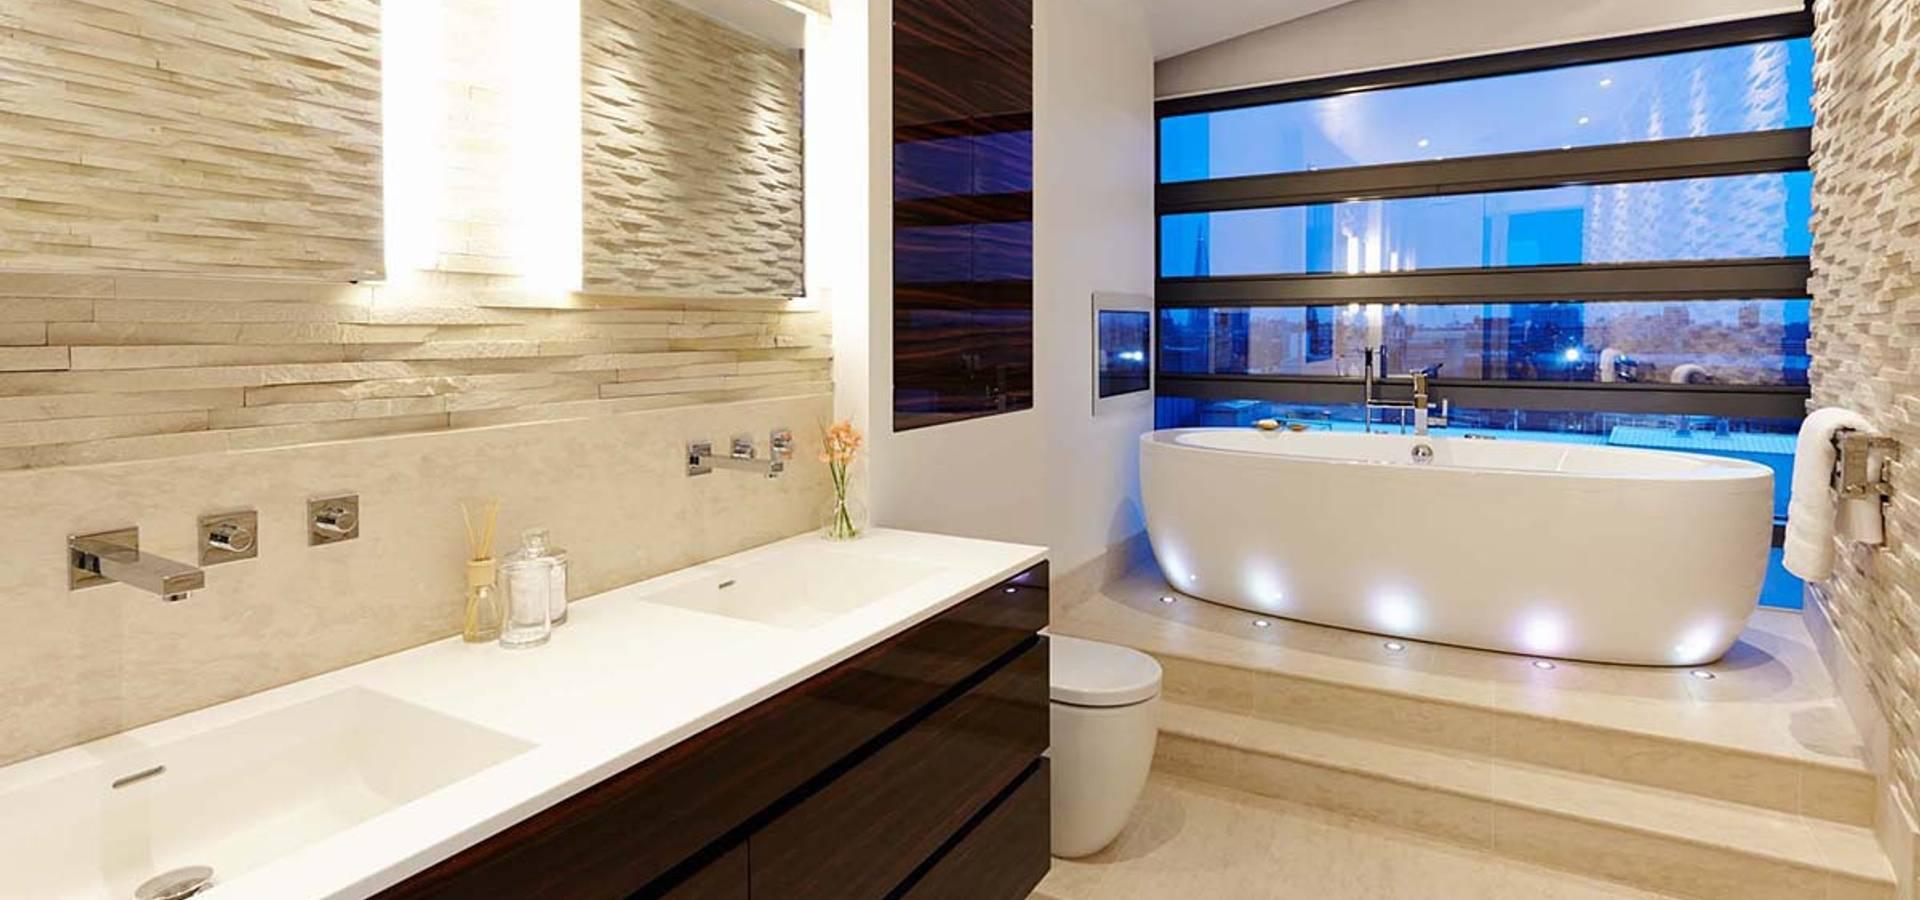 Residence Interior Design Ltd